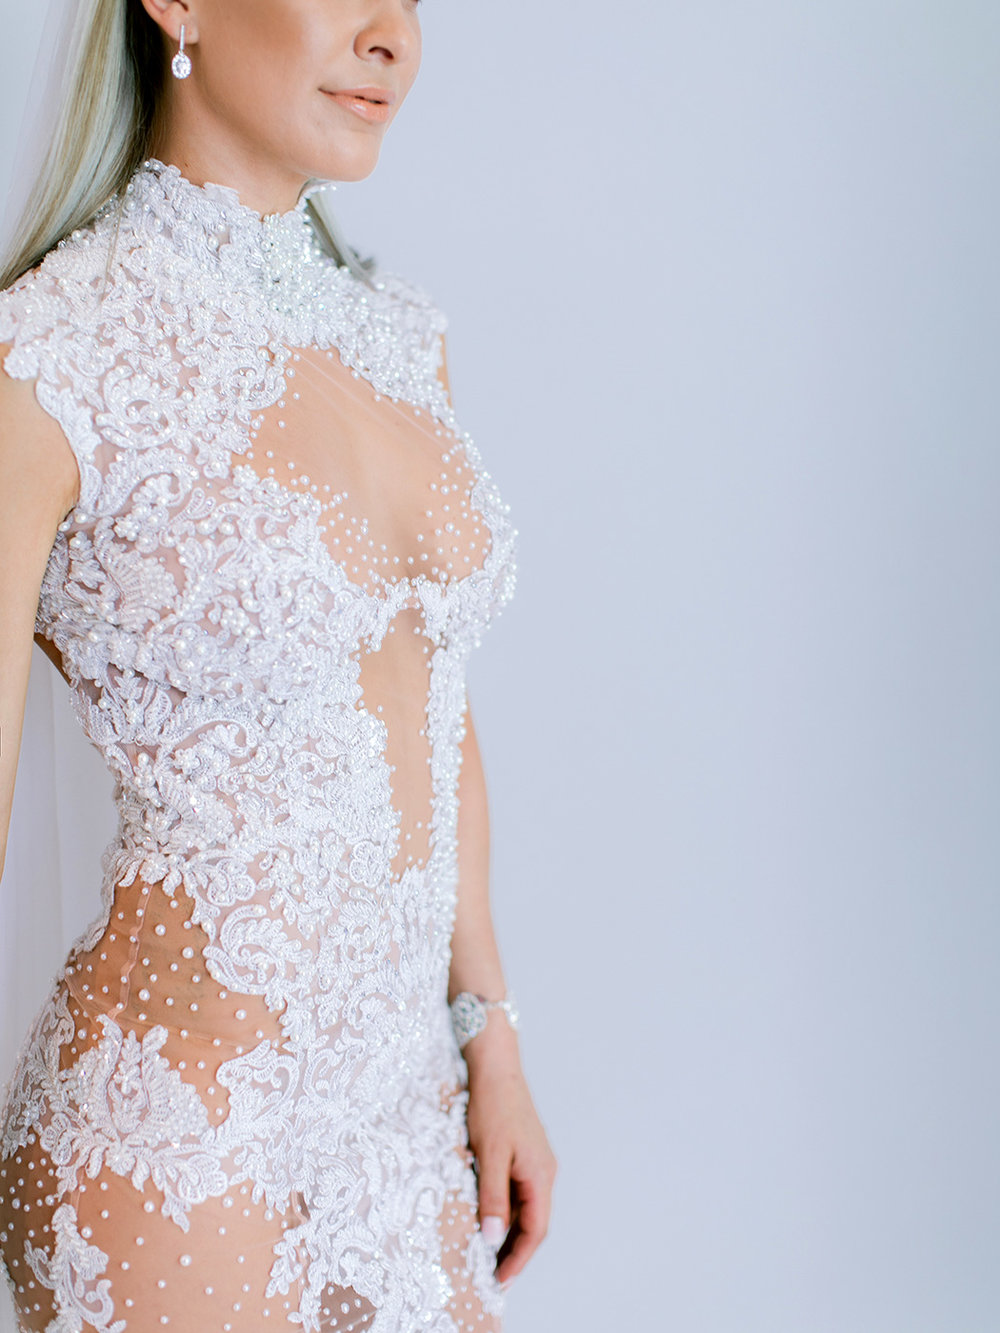 Gert Johan Coetzee Dress | Rensche Mari Photography